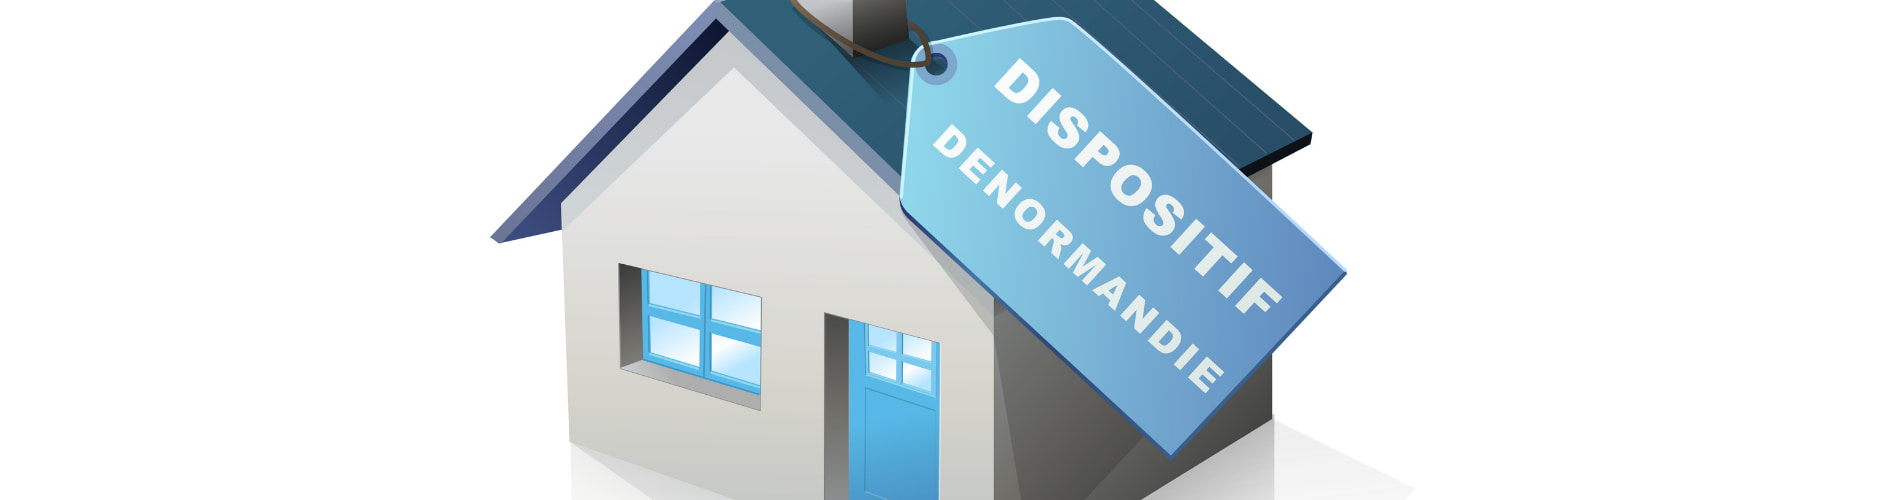 Dispositif Denormandie